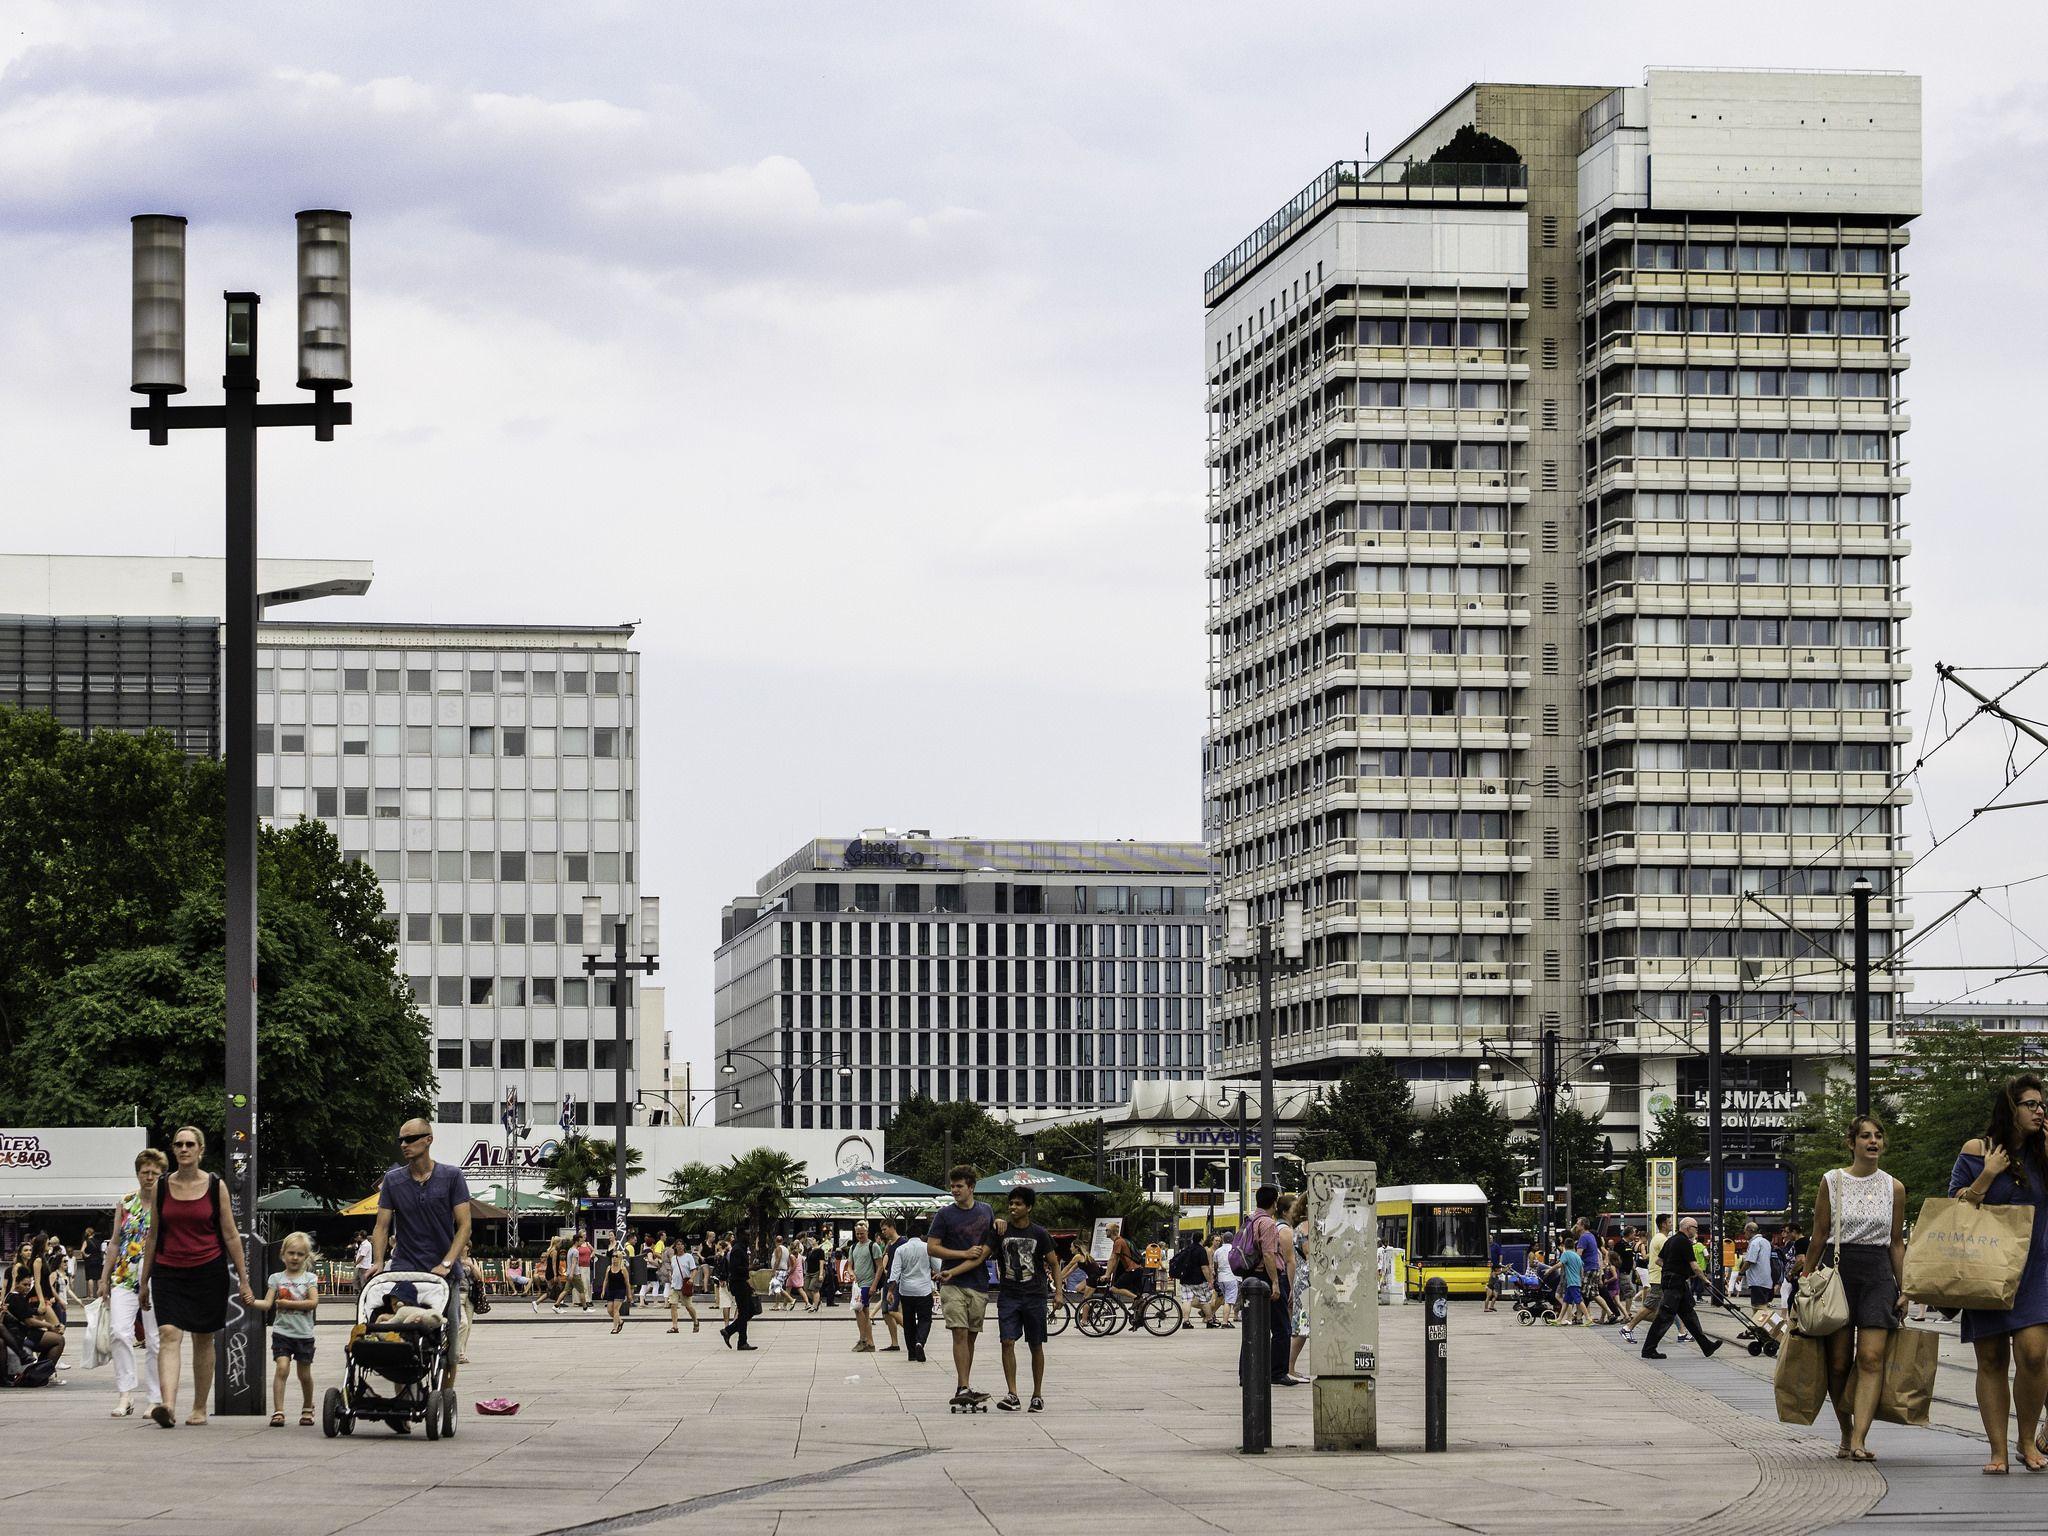 Alexanderplatz Scenes Street View Street